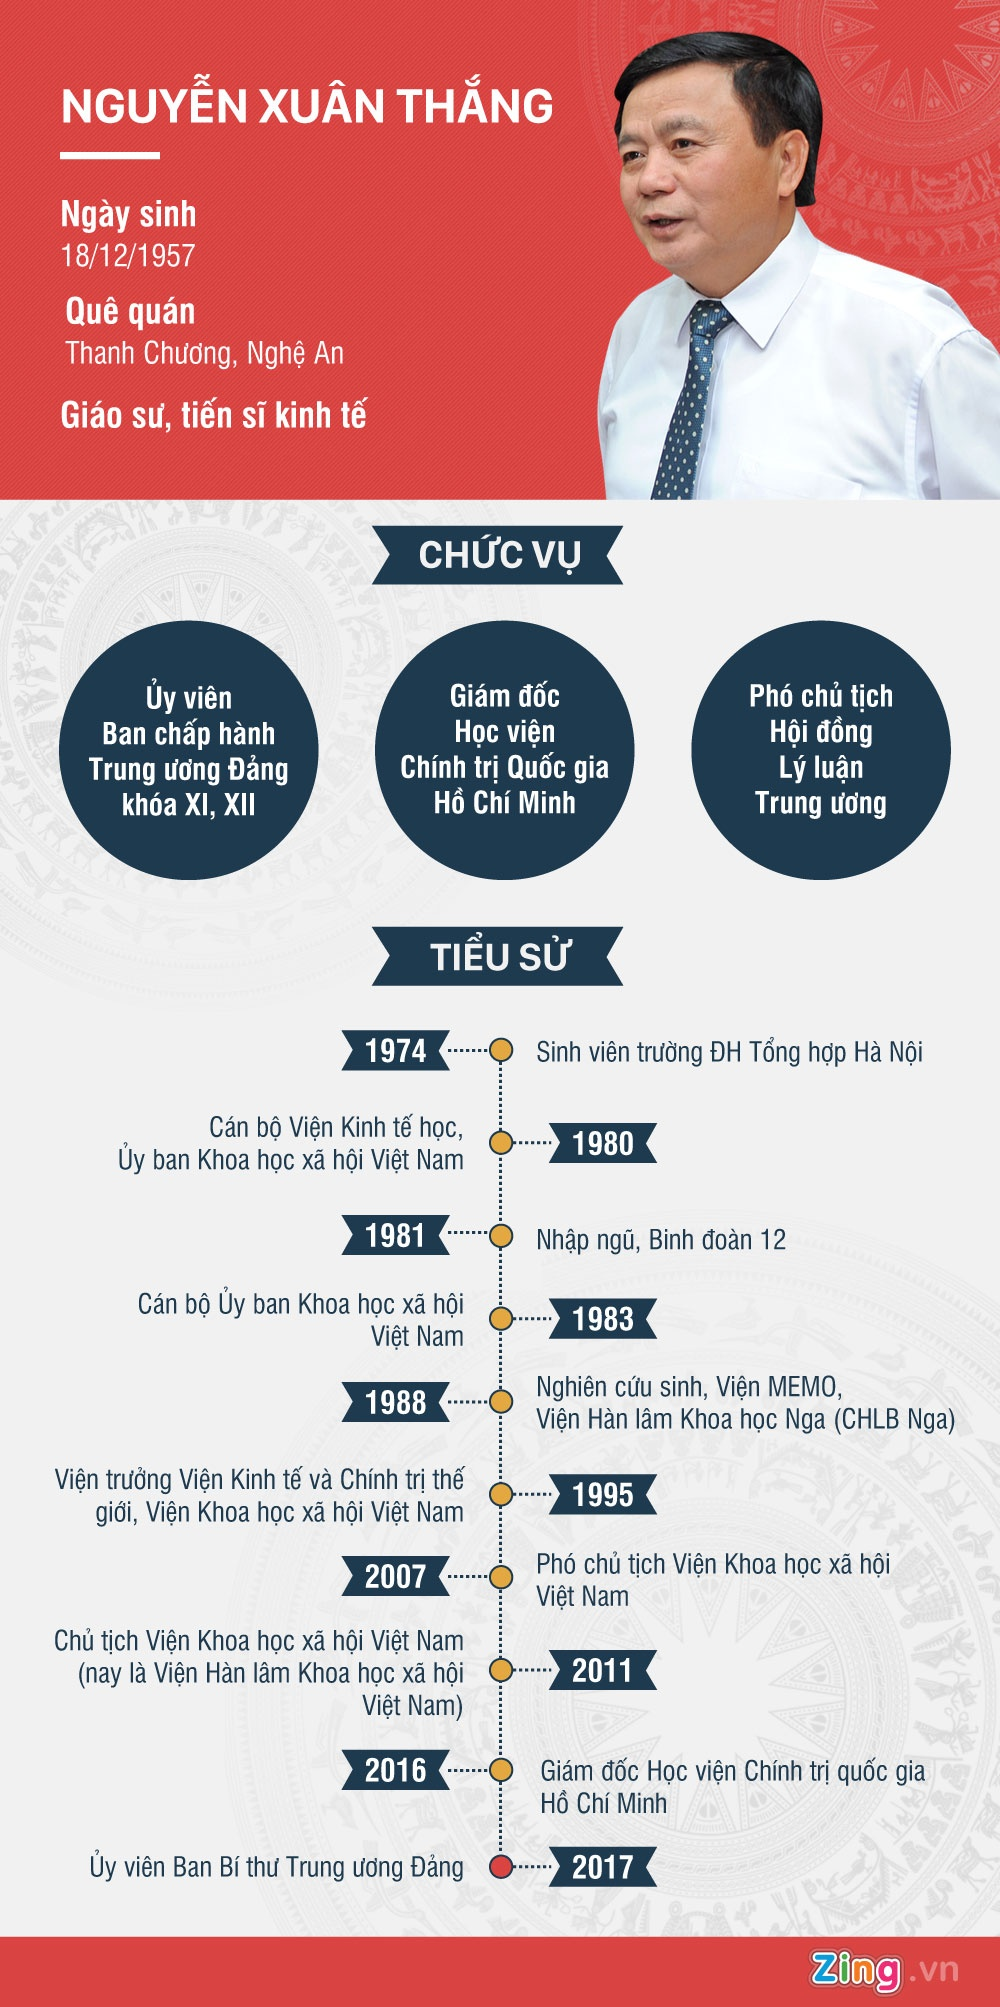 Chan dung 2 tan uy vien Ban Bi thu Trung uong Dang hinh anh 2